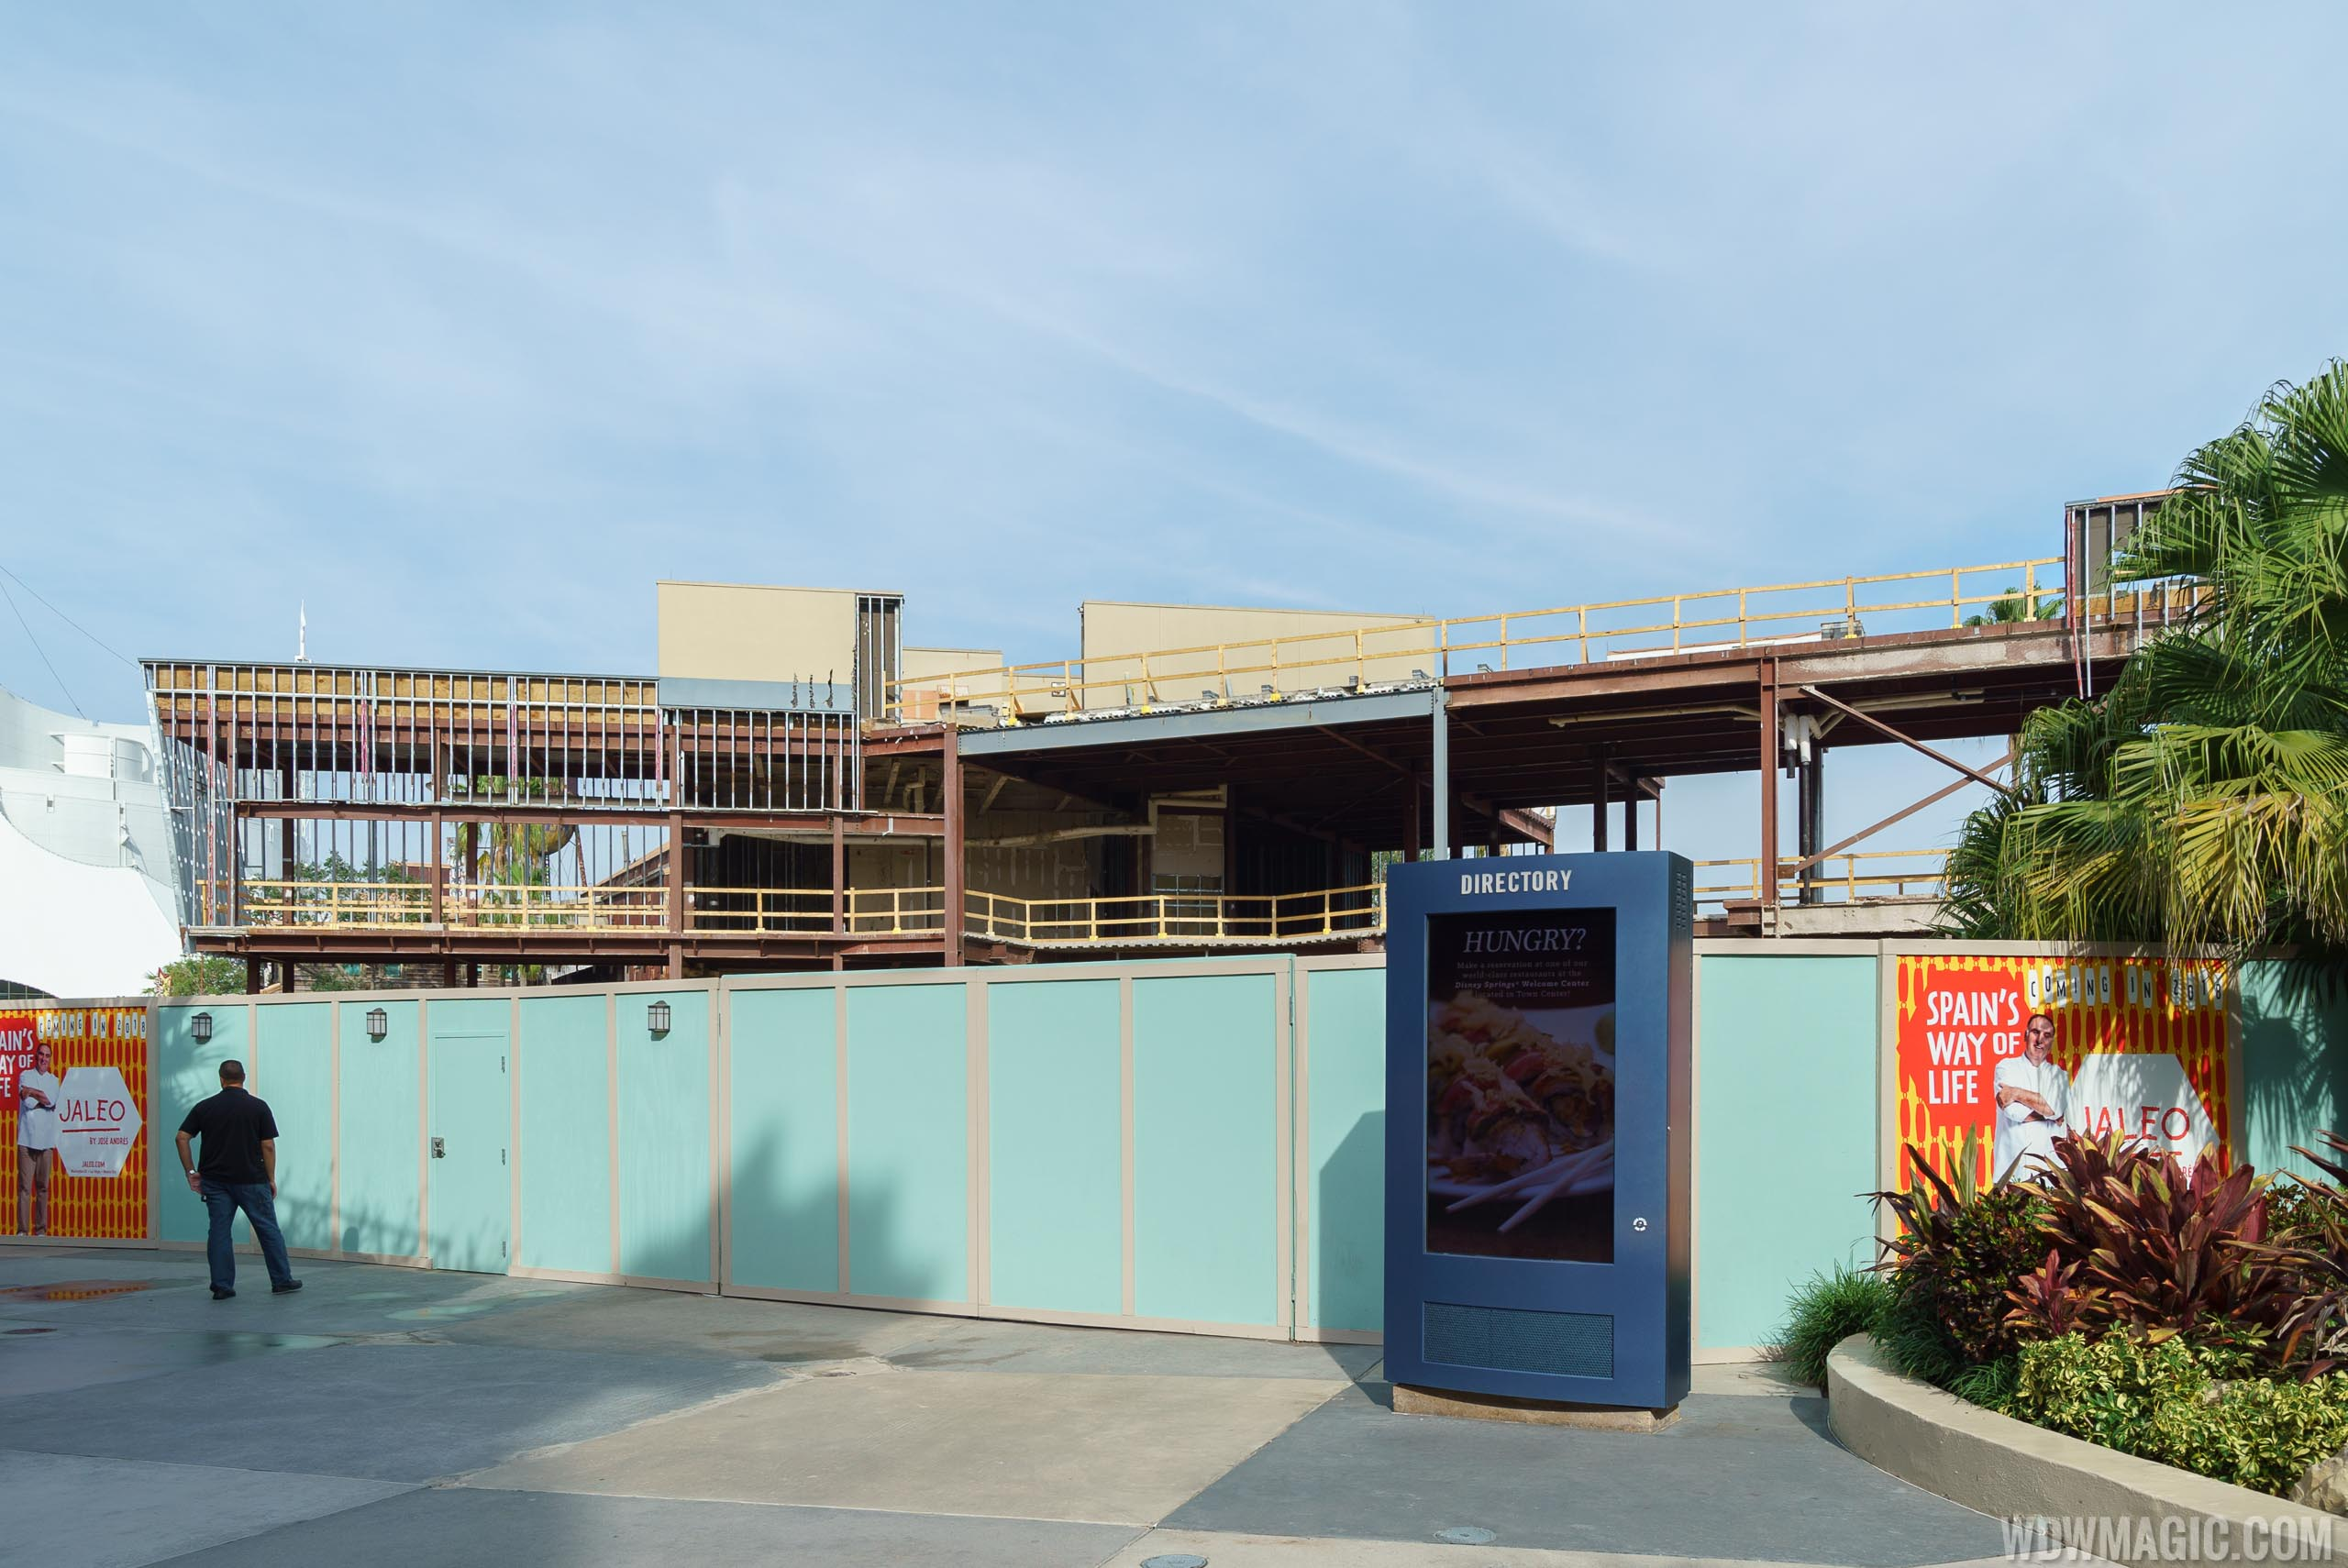 Jaleo construction